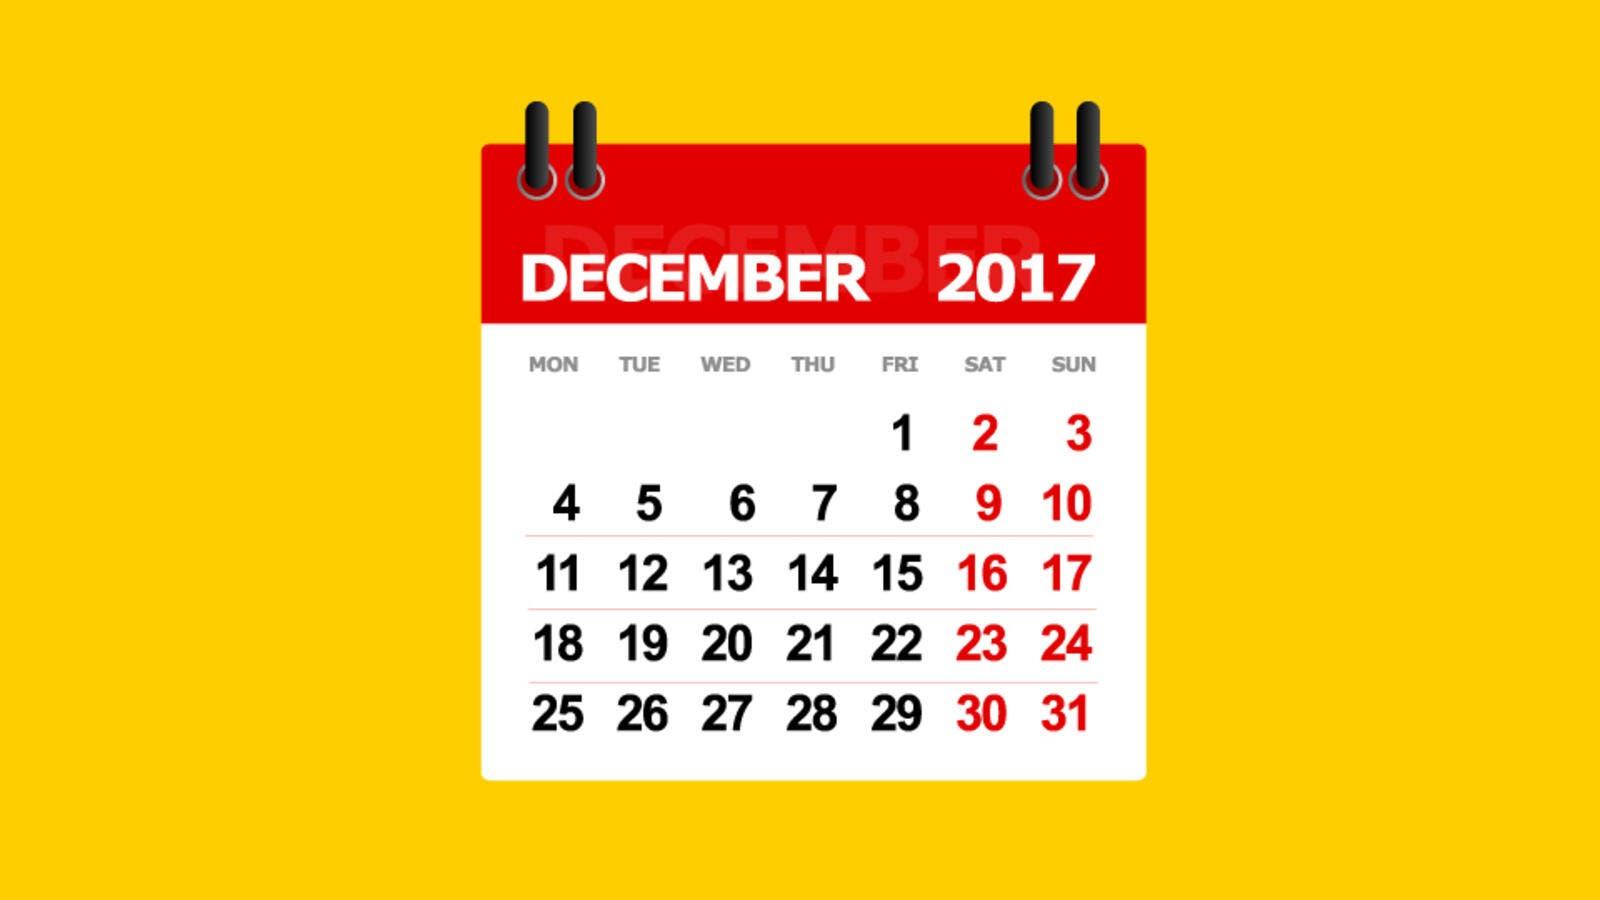 1d51415b25ebf توقعات الأبراج لشهر كانون الأول  ديسمبر 2017 من ماغي فرح